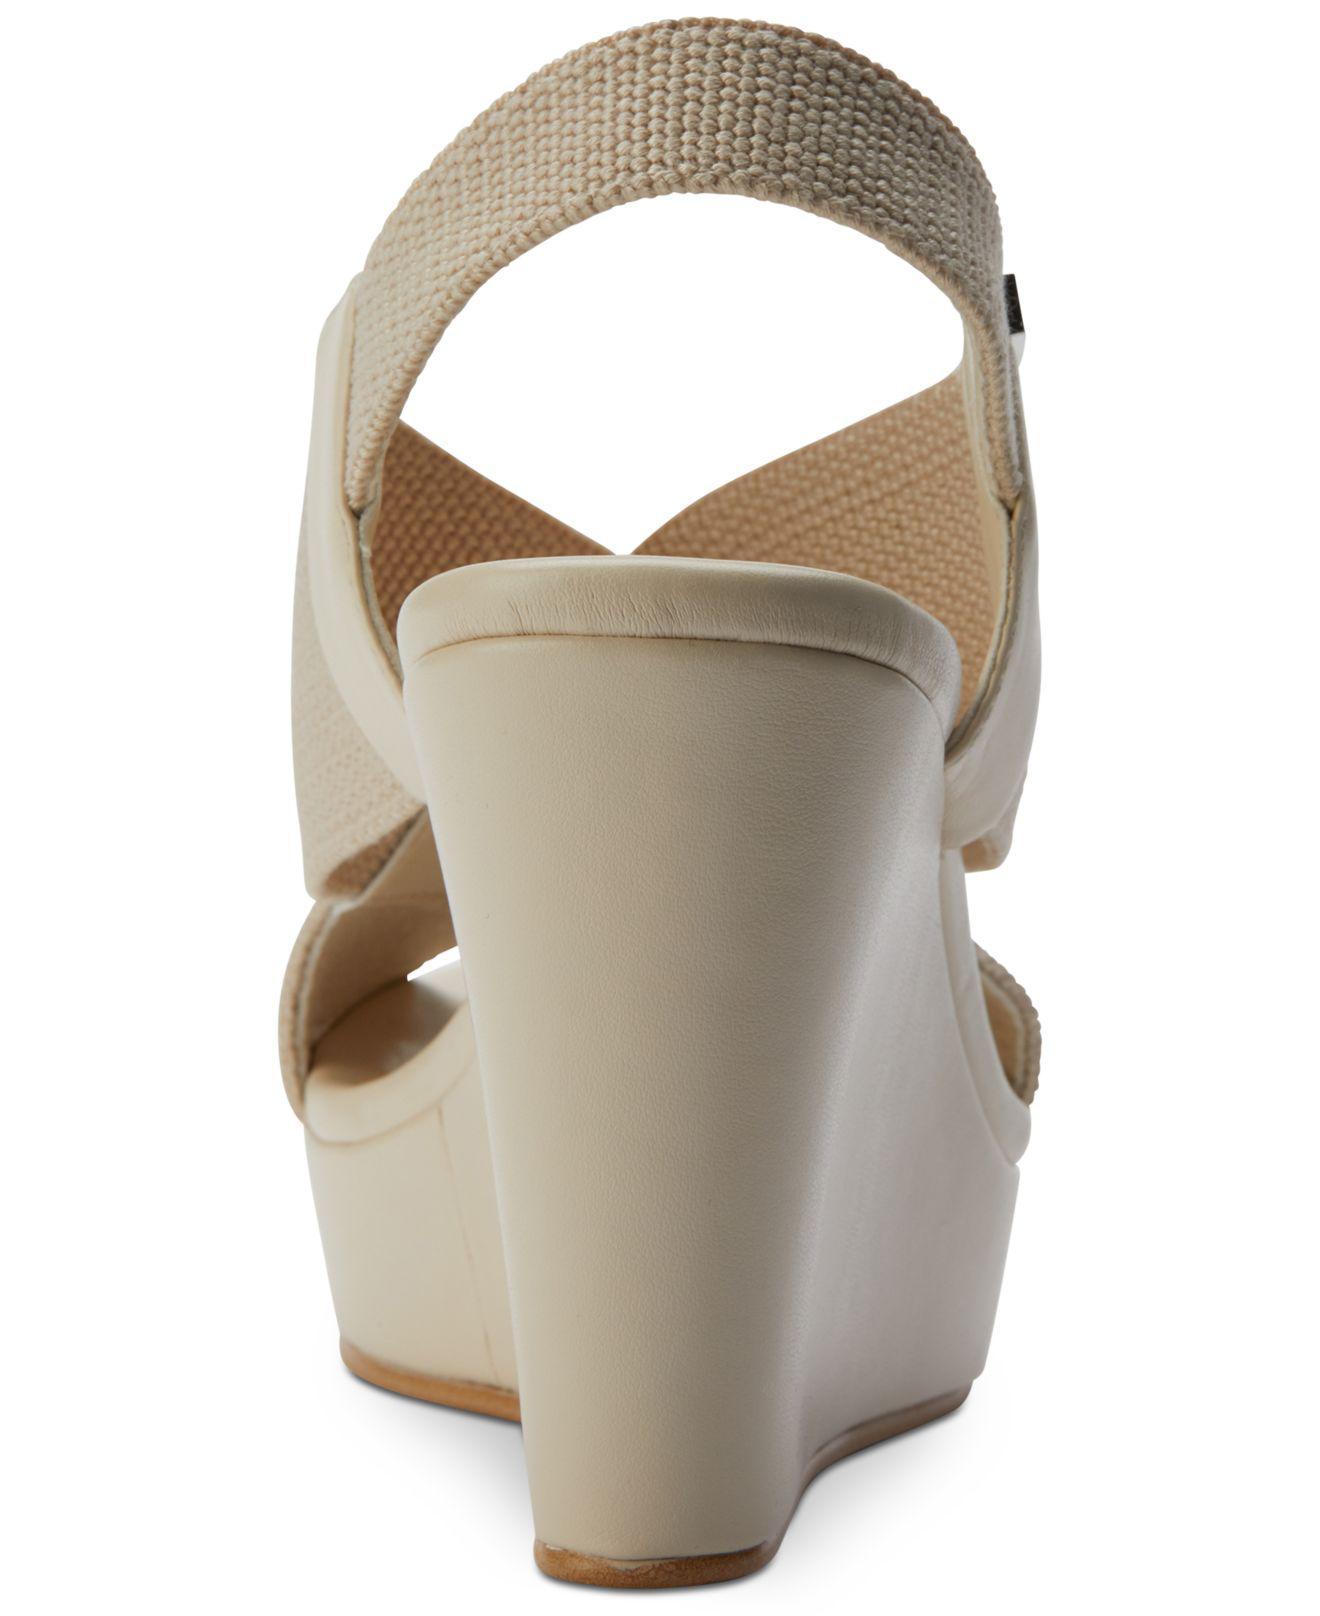 88d35bfd46c DKNY Womens Jamara Open Toe Casual Platform Sandals